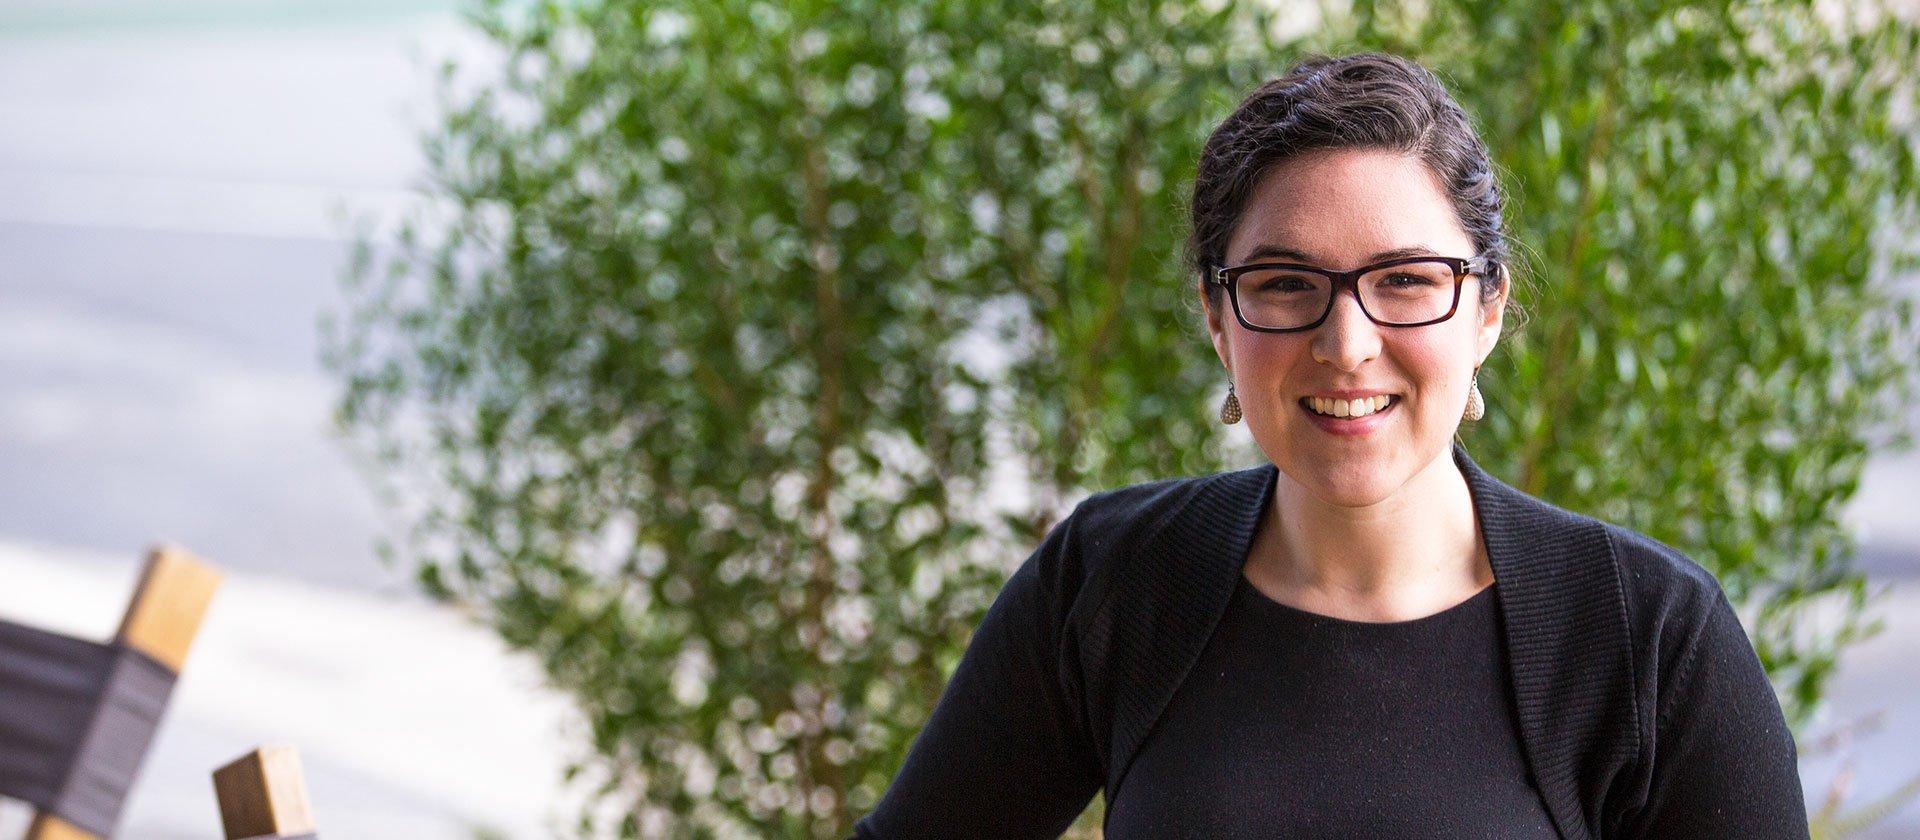 Jana Clifford from Le Cordon Bleu Master of Gastronomic Tourism Residential Program